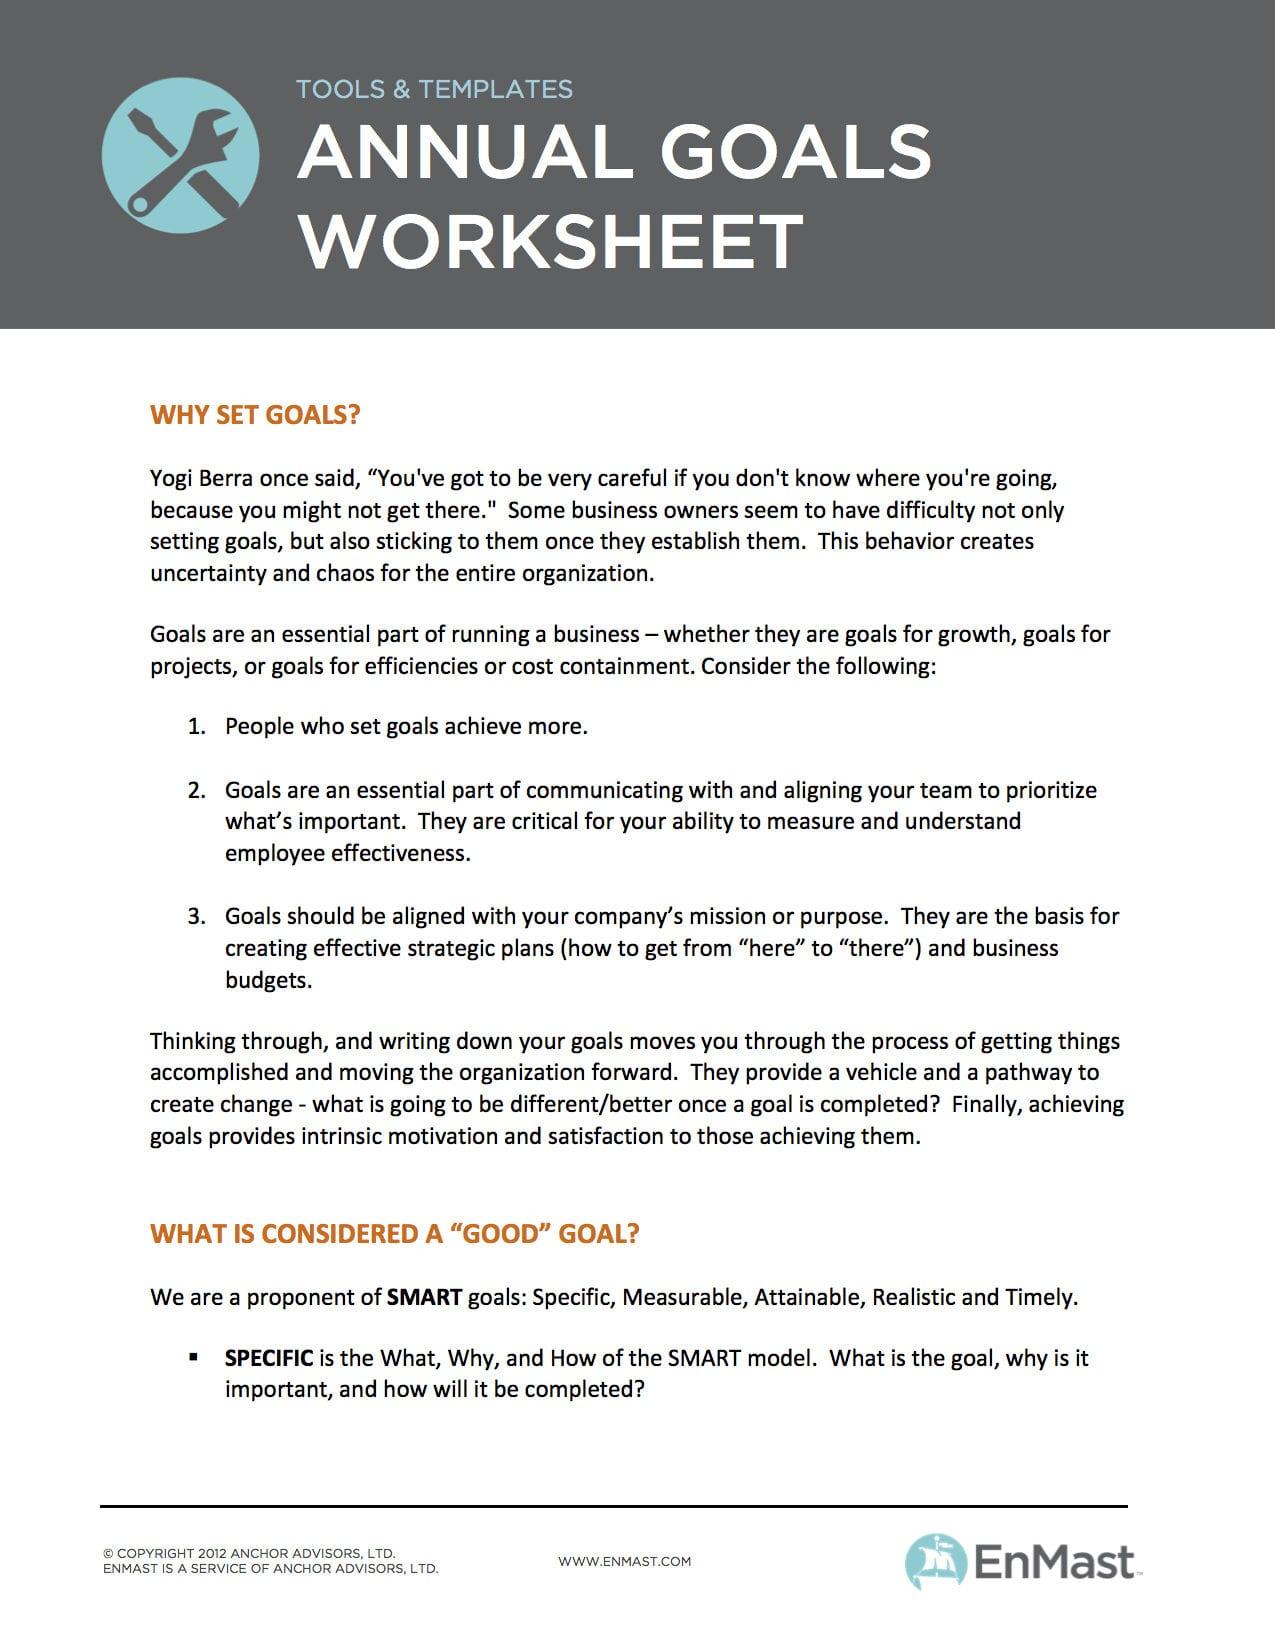 Annual Goal Setting Worksheet For Business Also Business Goal Setting Worksheet